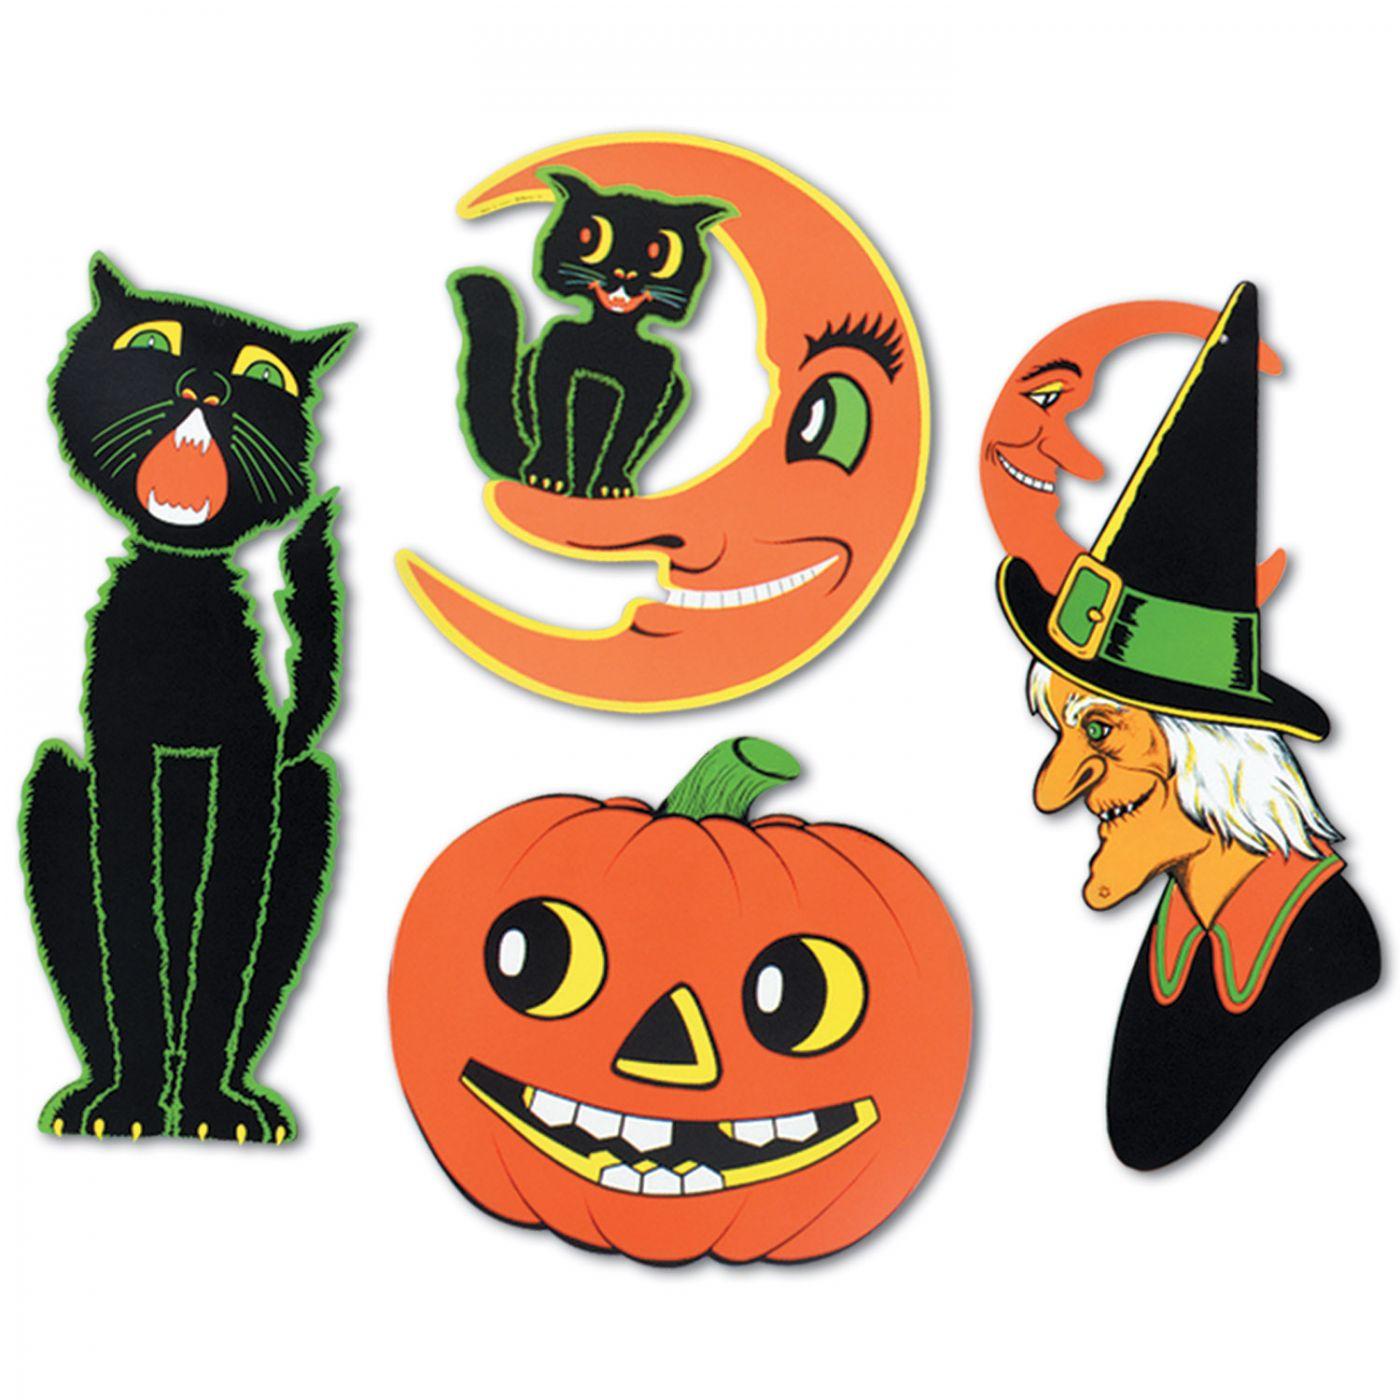 Pkgd Halloween Cutouts image